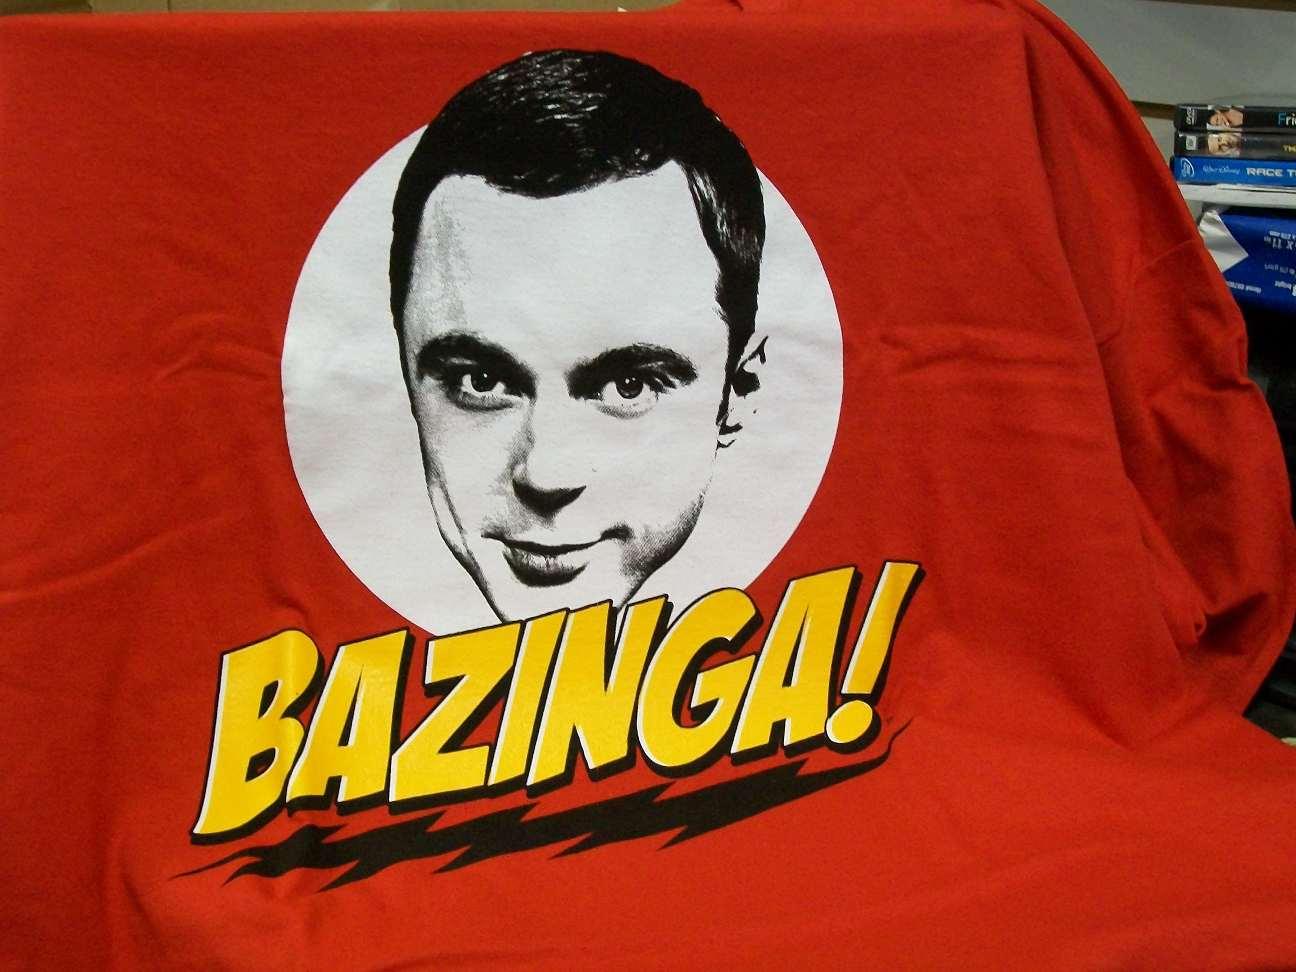 The Big Bang Theory: il 'Bazinga' di Sheldon dà il nome a una nuova ape